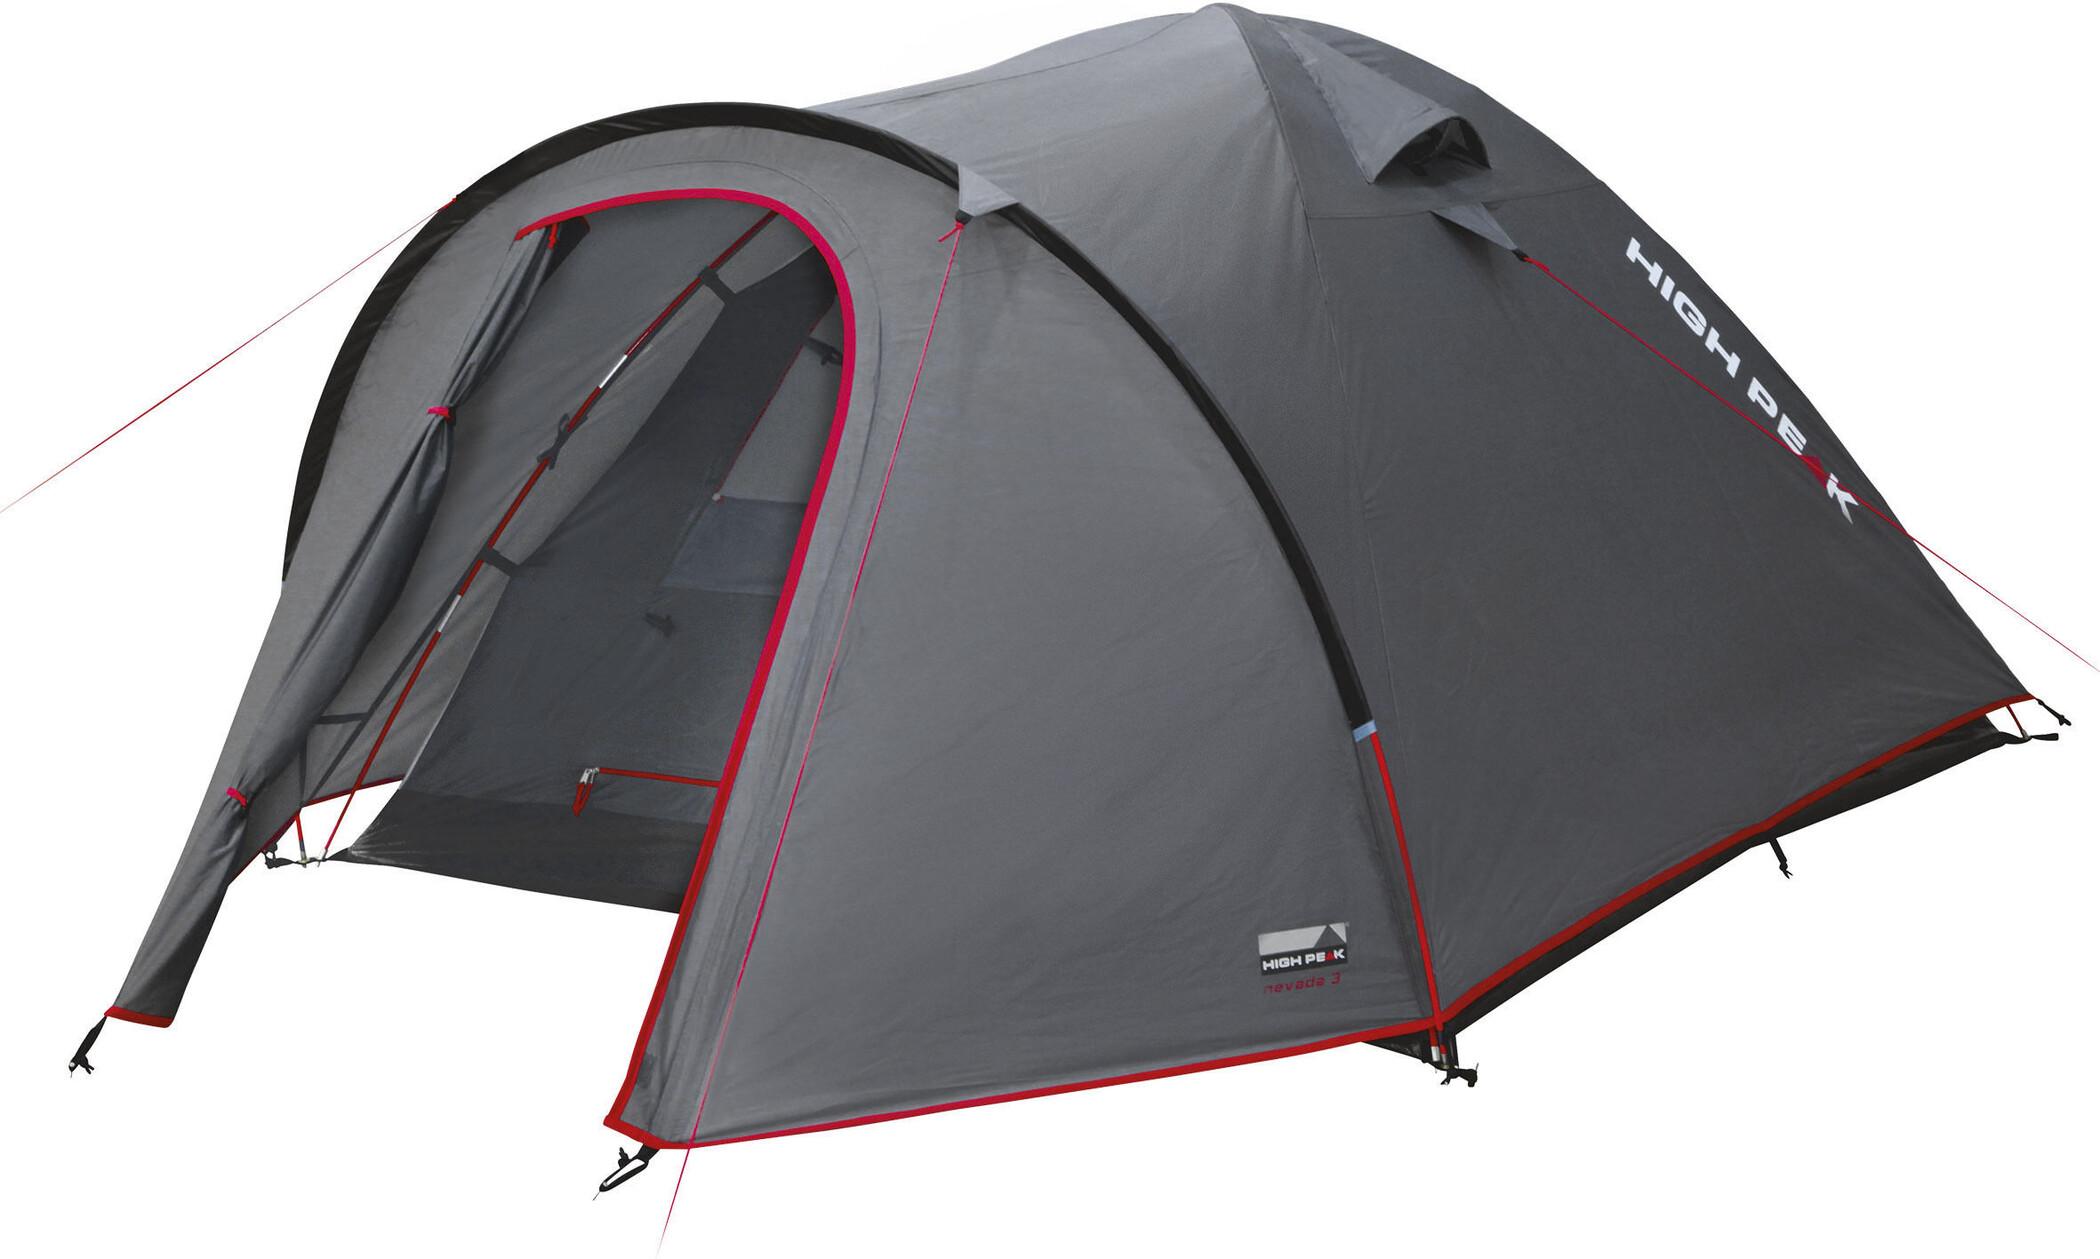 High Peak Nevada 2 Telt, dark grey/red (2019)   Misc. Transportation and Storage